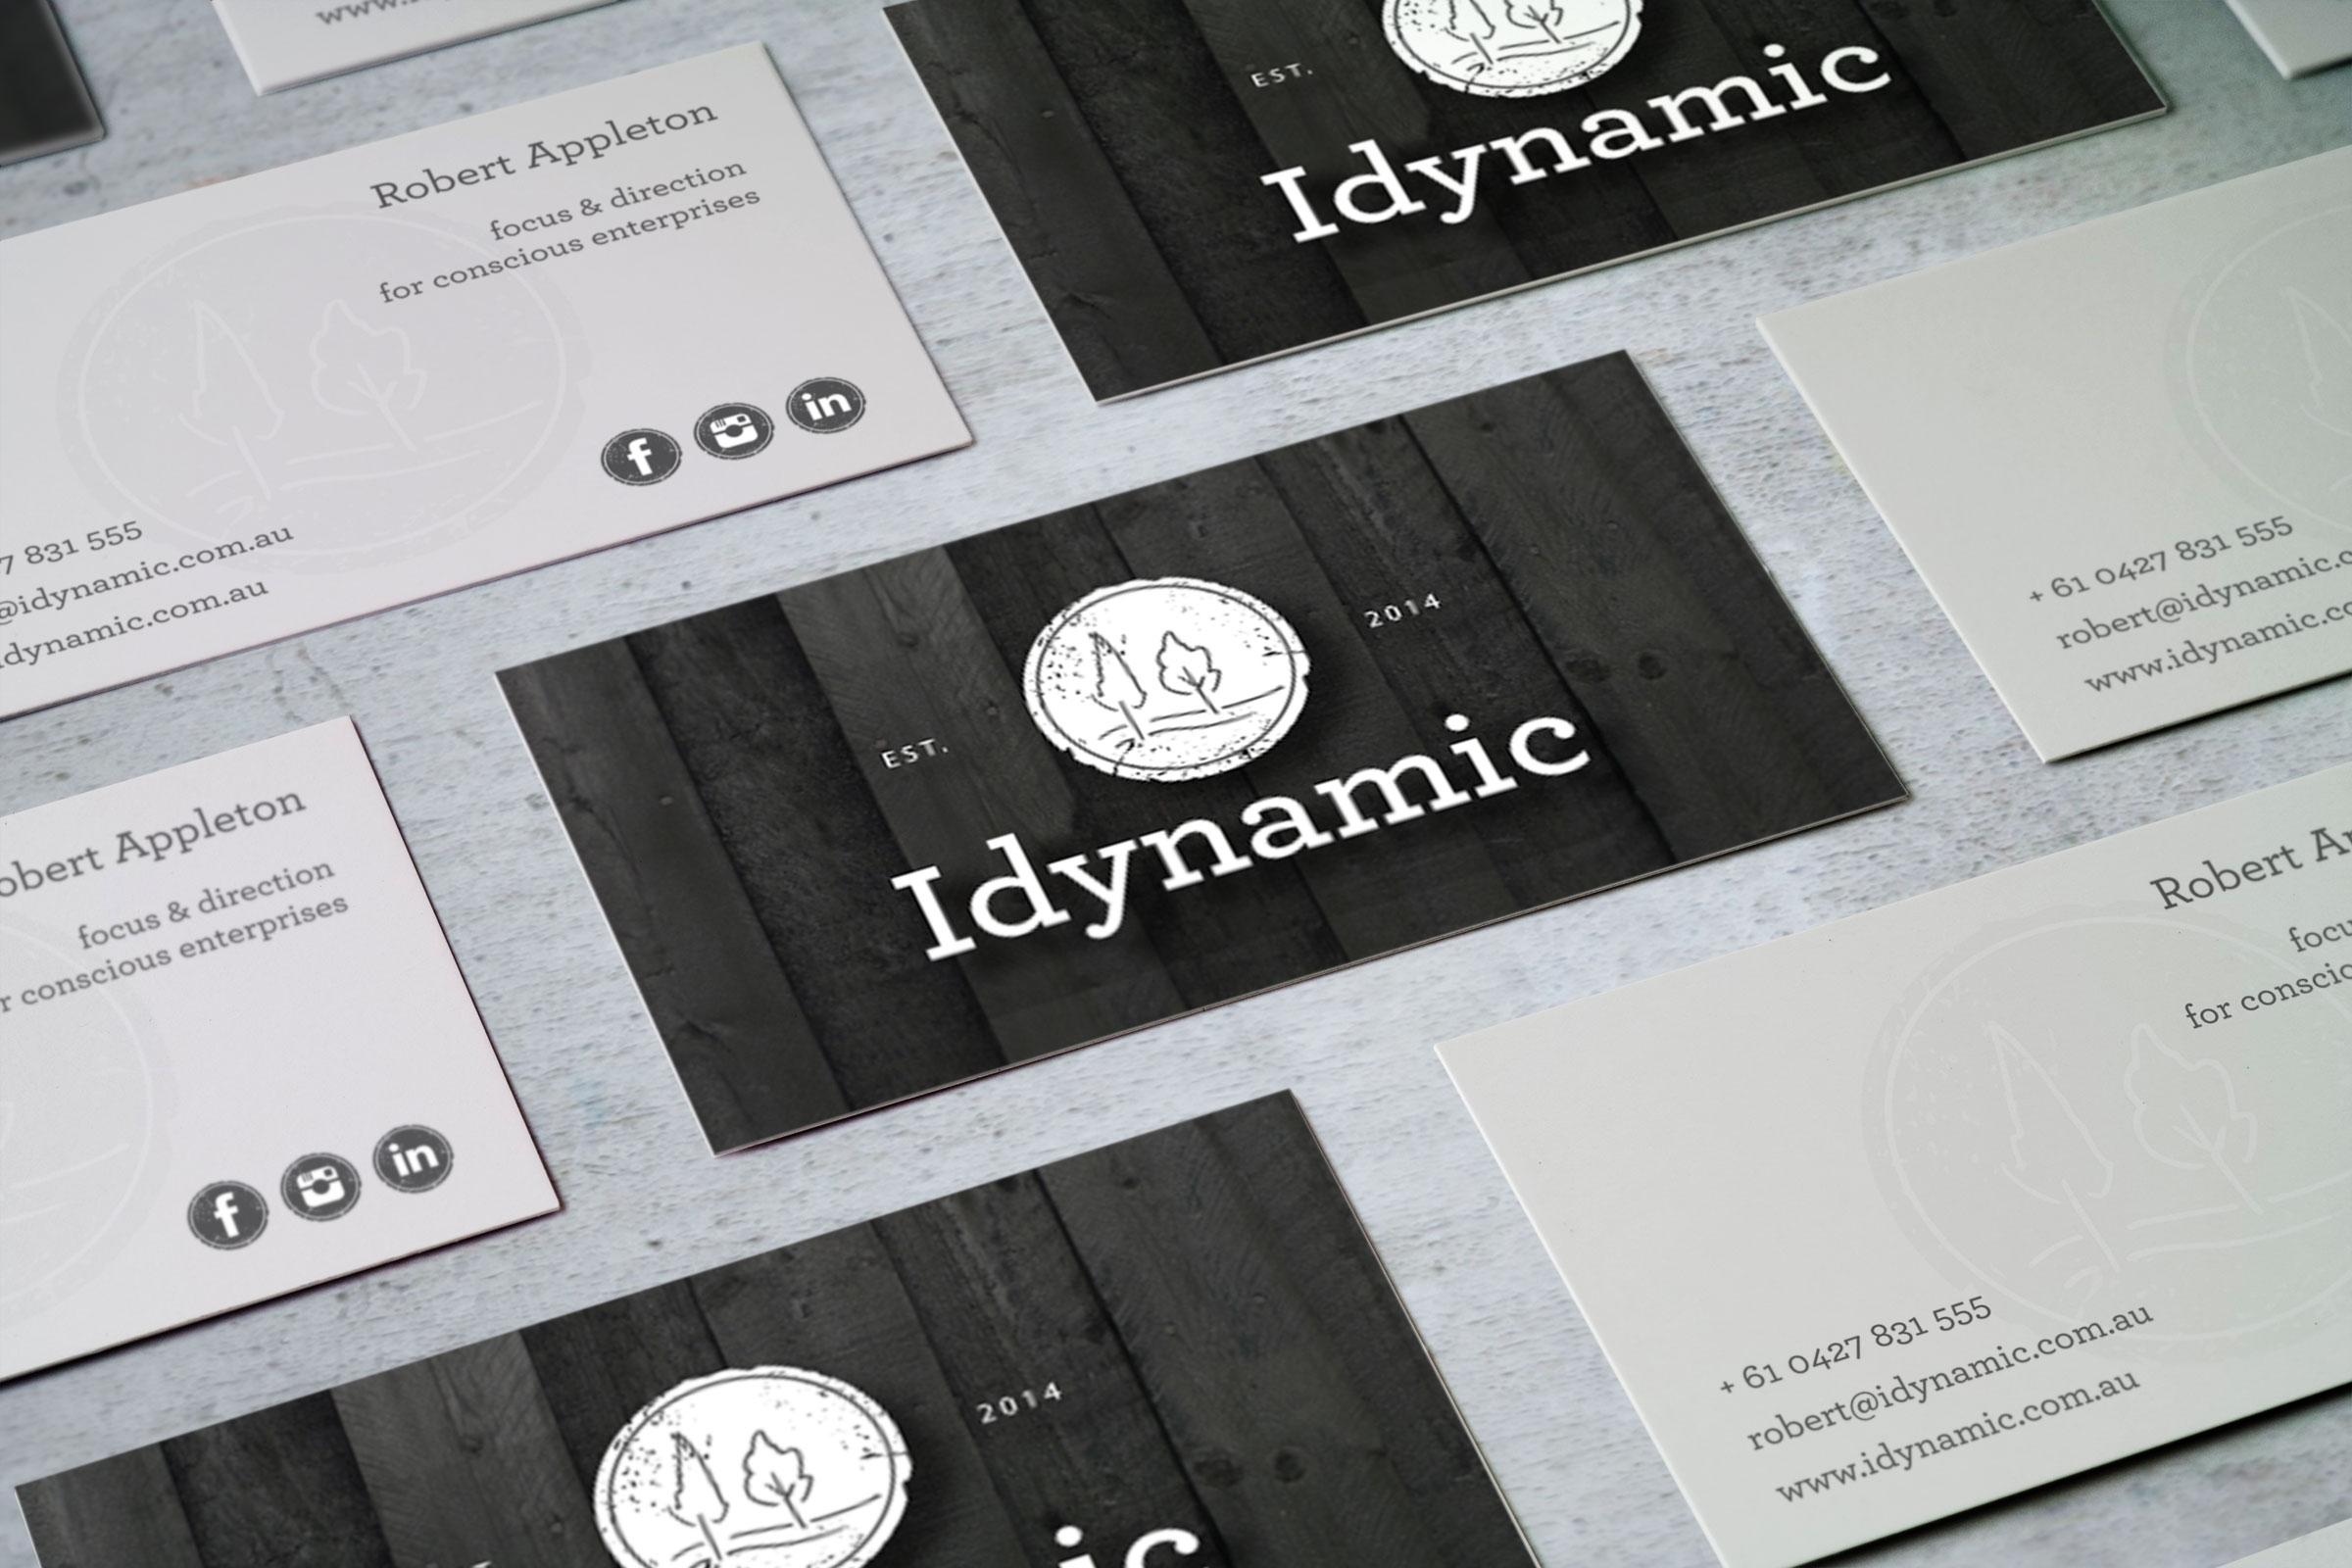 Idynamic-cards